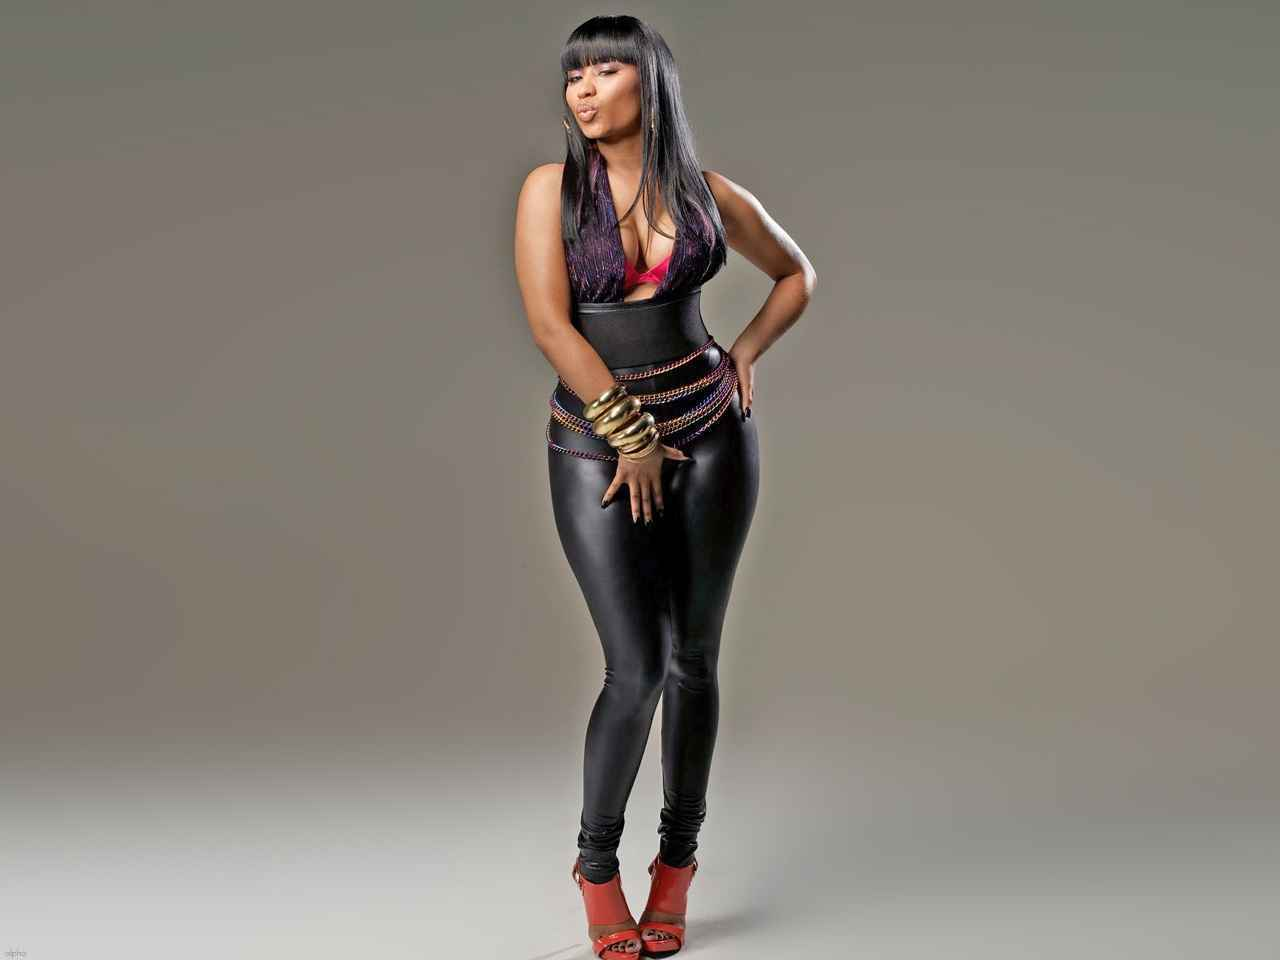 Nicki Minaj nicki